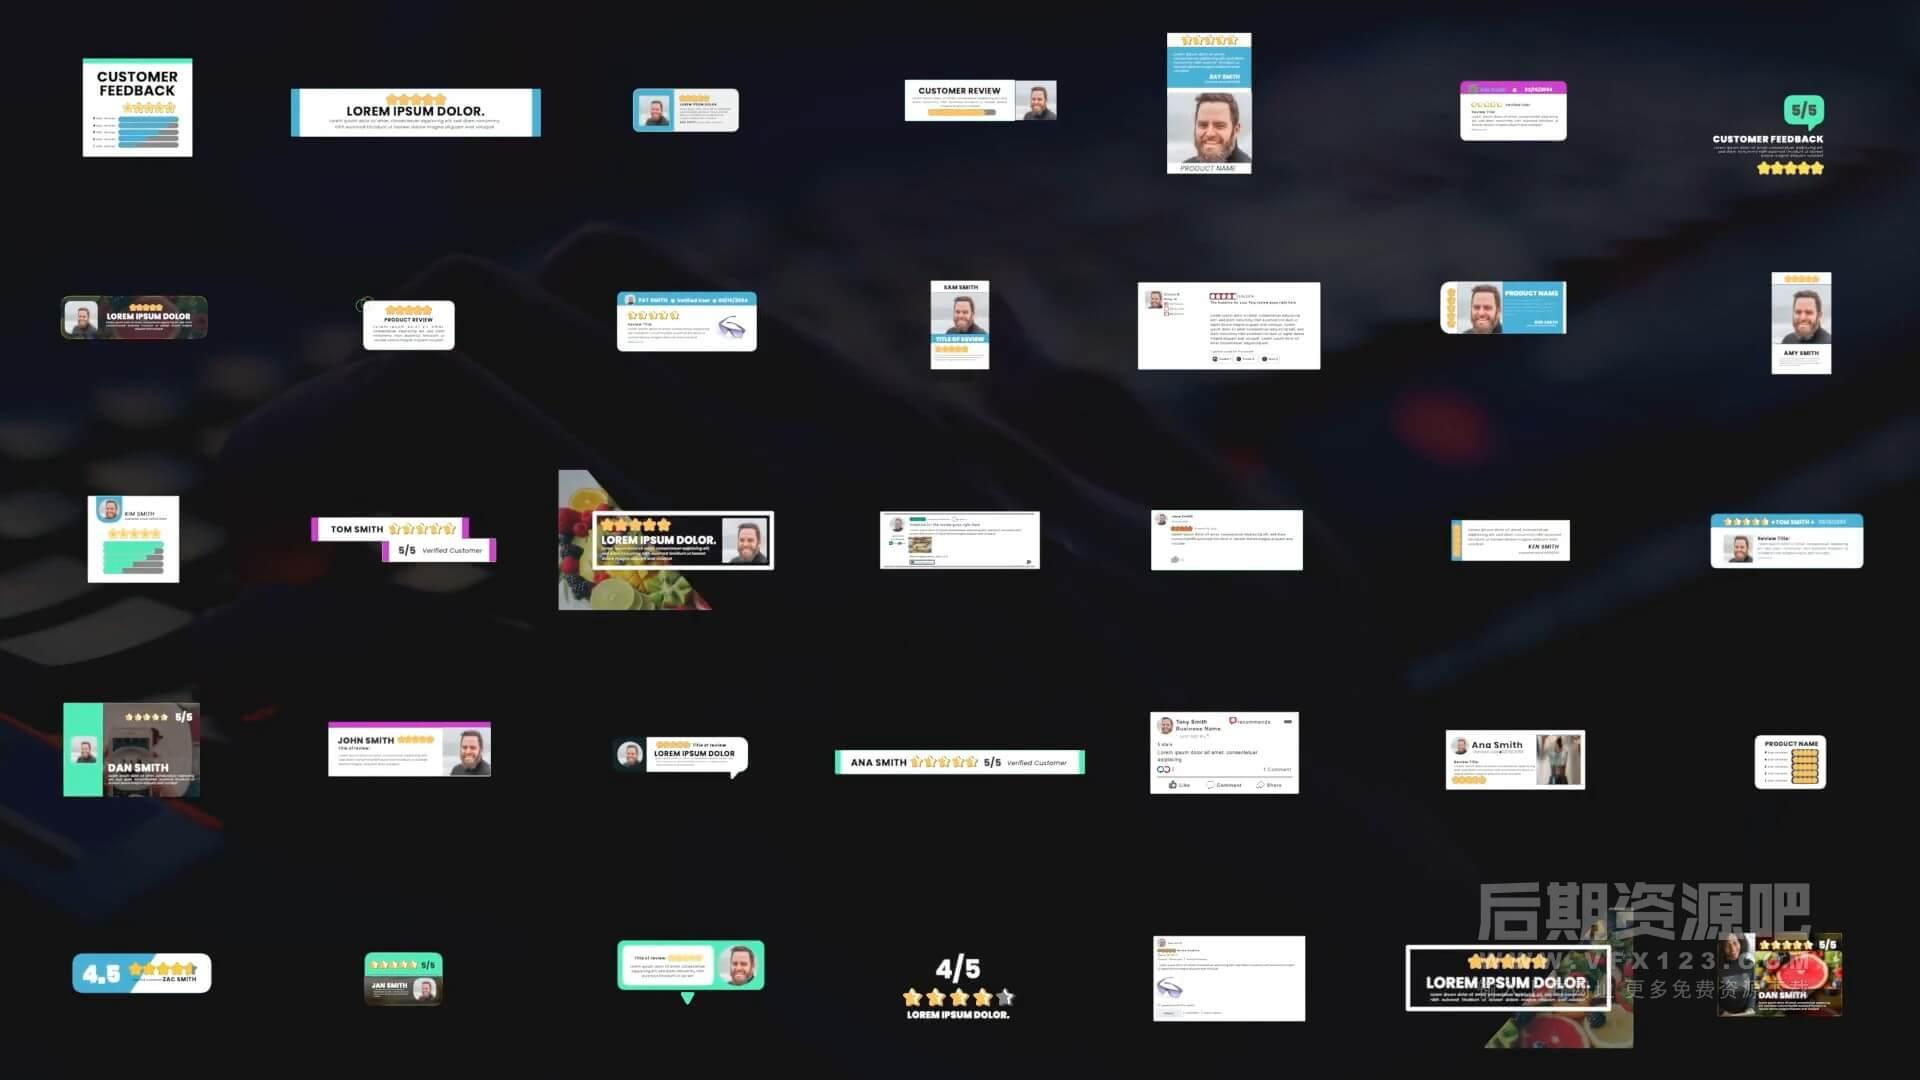 fcpx插件 35组评分星级评论回复标题模板动画 支持M1 Review Pop